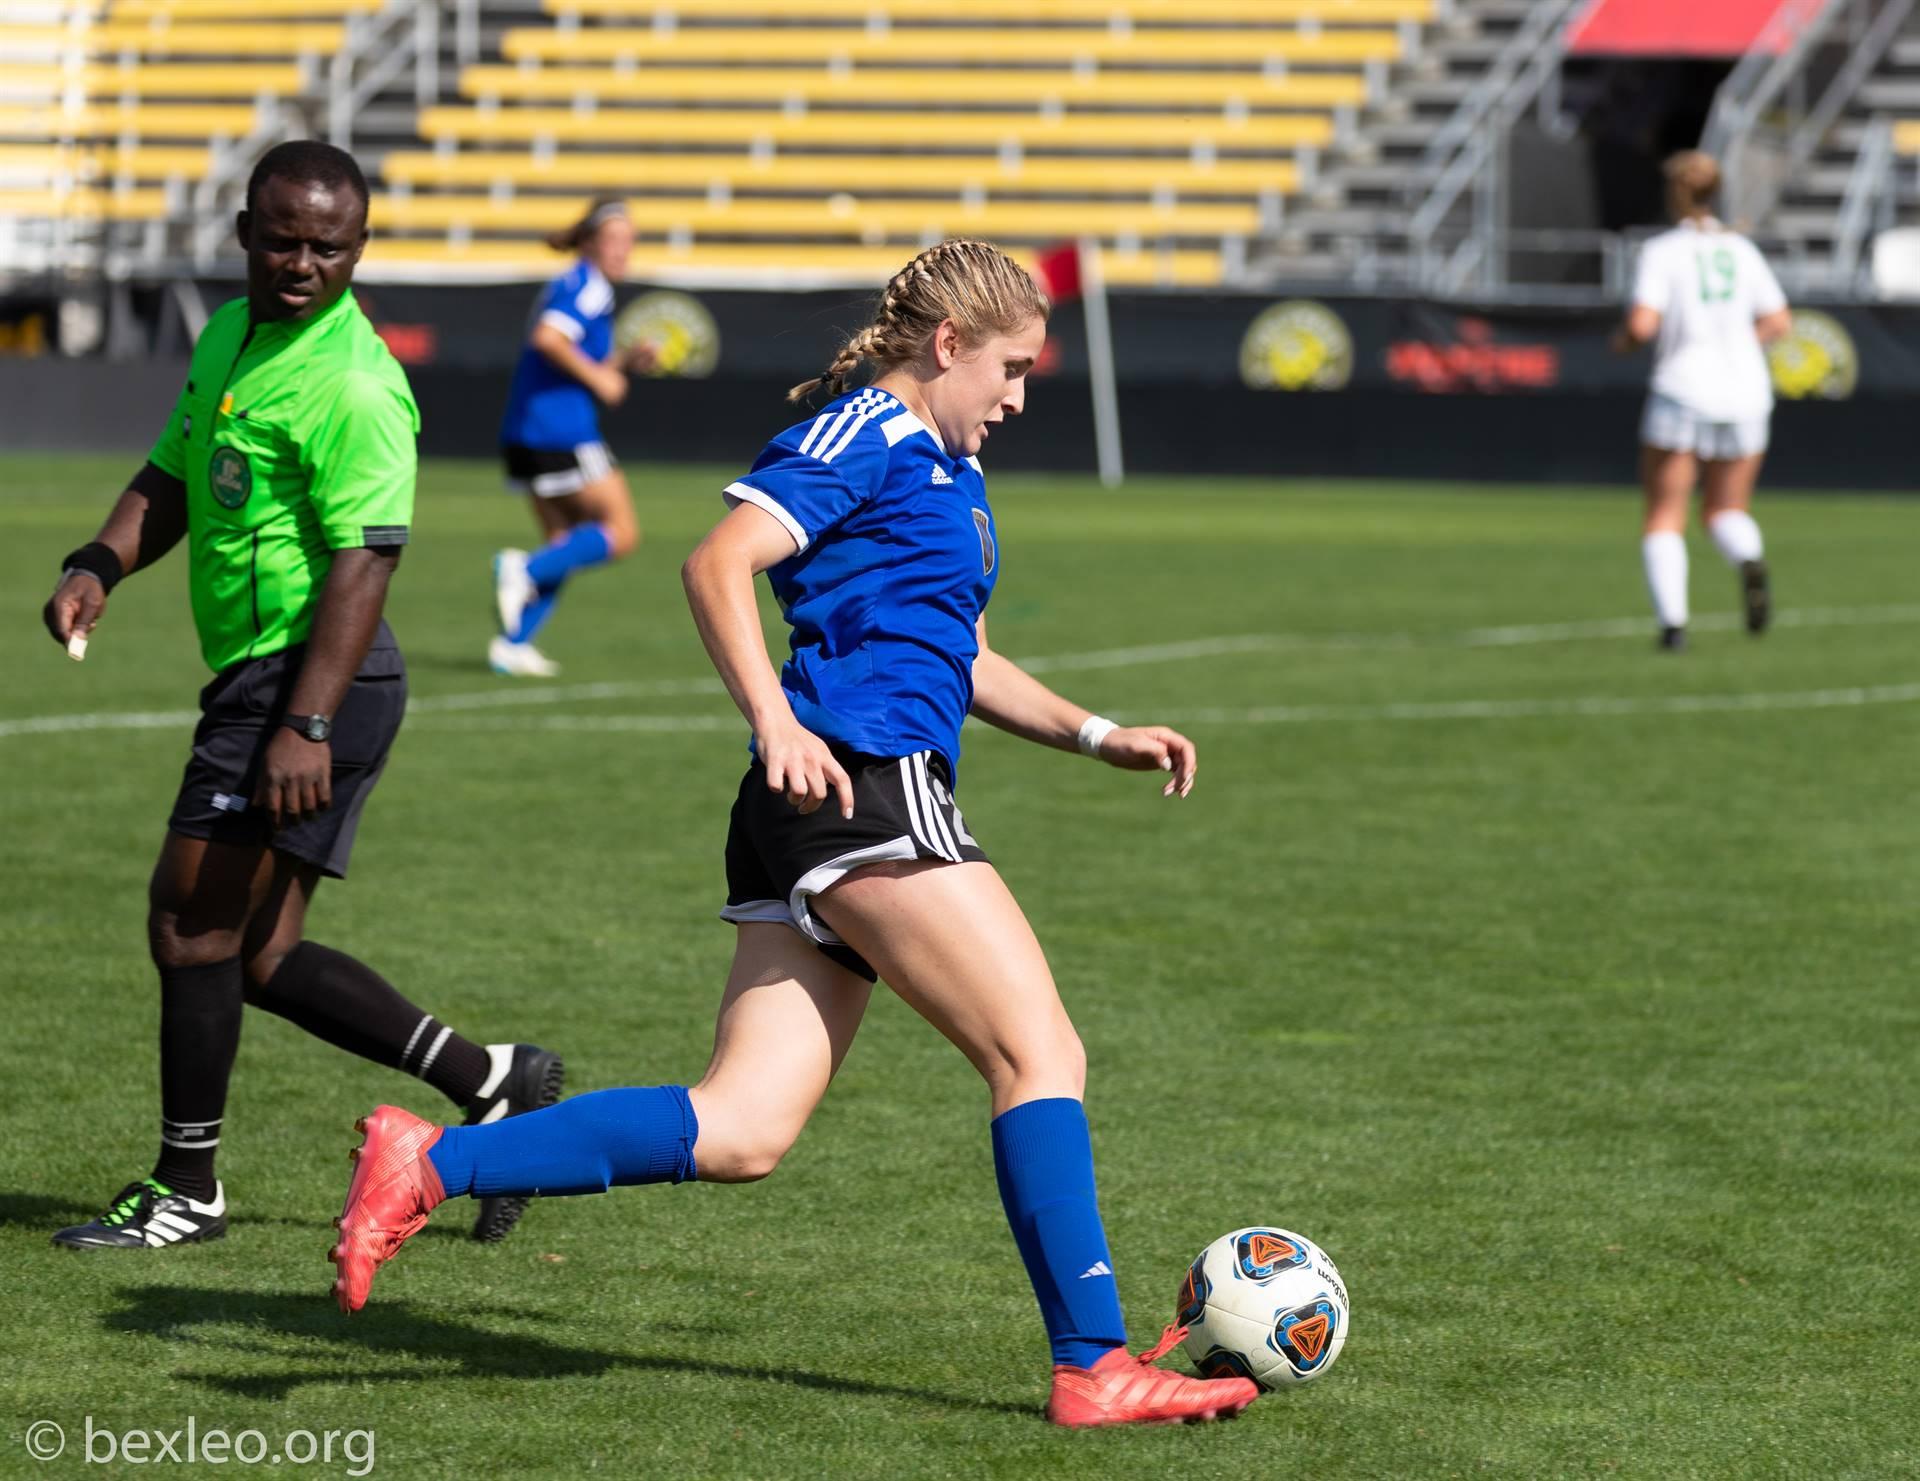 Girls Soccer Player advances the ball @ Crew Stadium